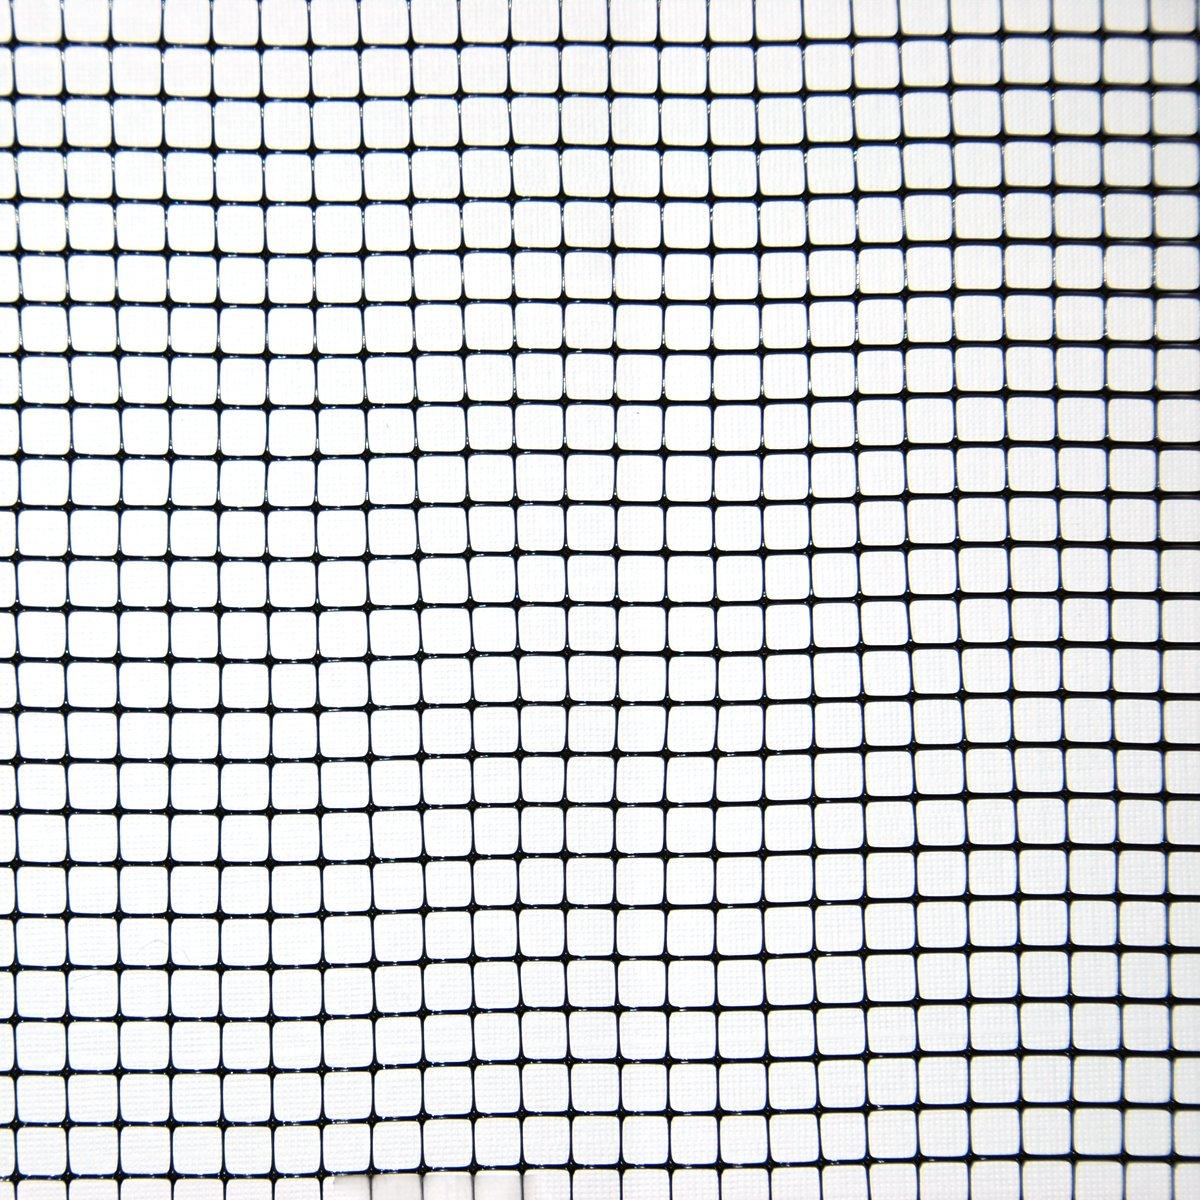 Industrial Netting OV7100-168x100 Polypropylene Beetle Net, 1/6'' Mesh, 100' Length x 14' Width, Black